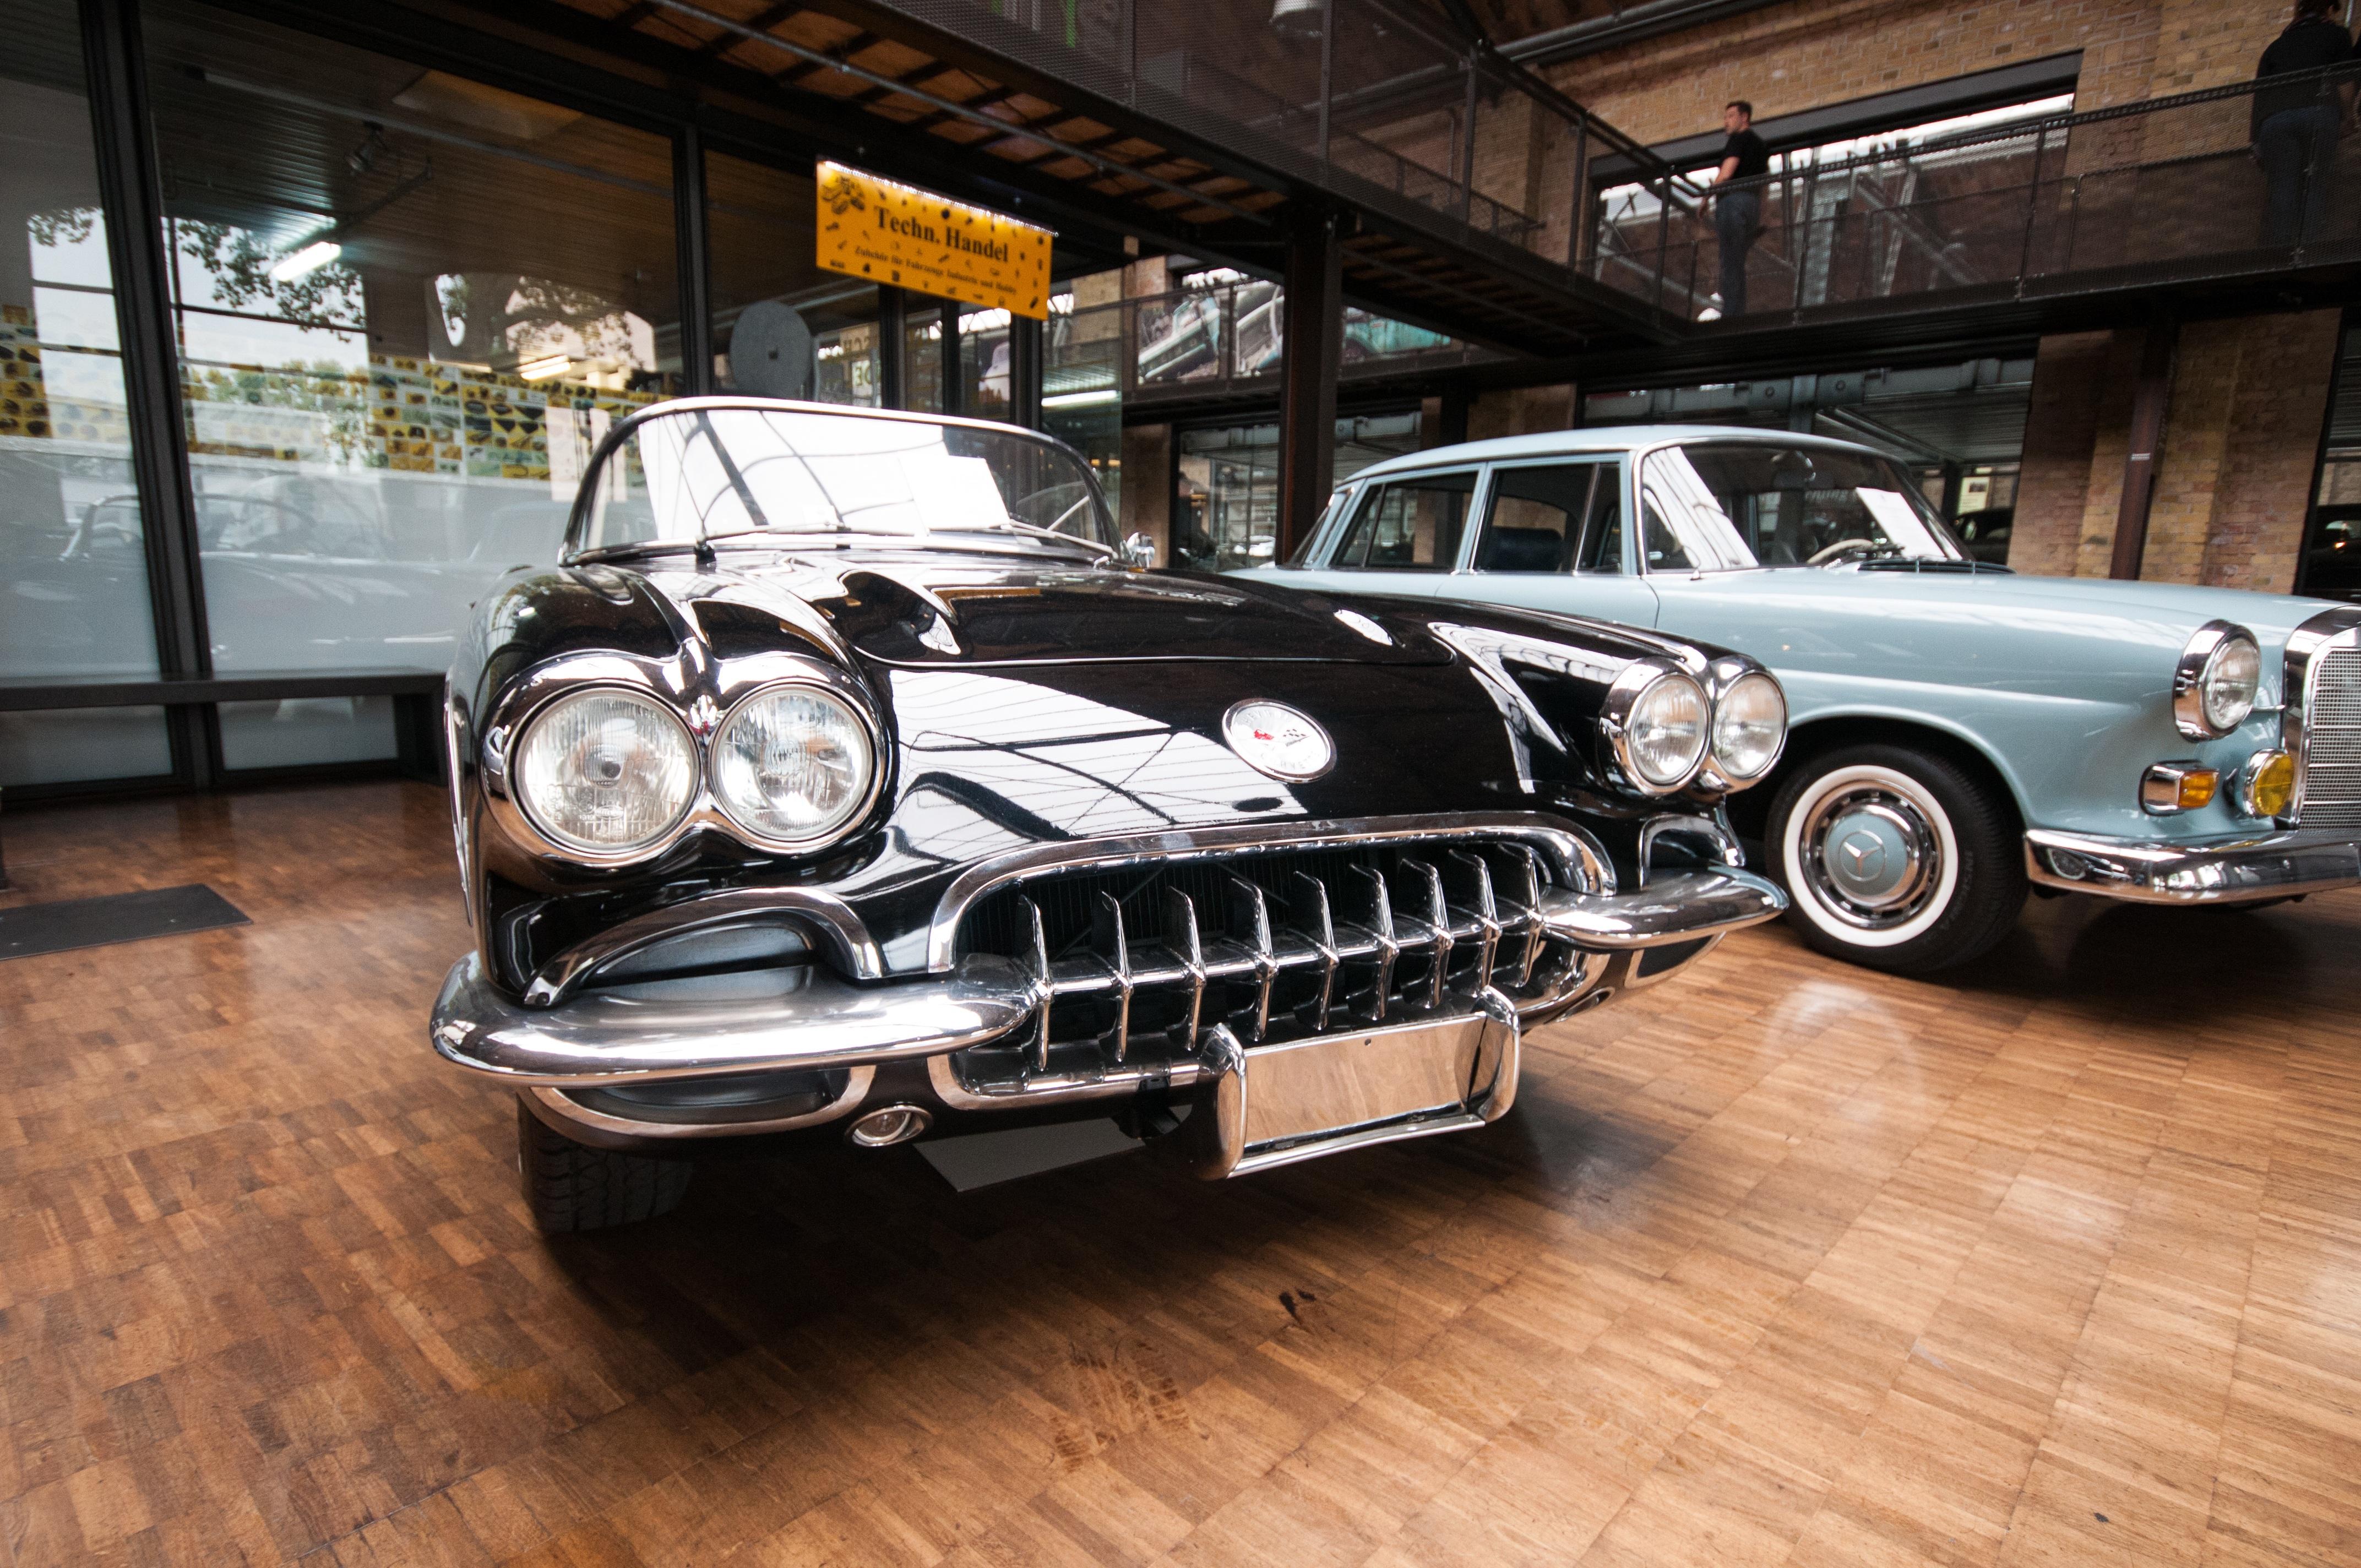 Free Images : retro, old, transportation, auto, classic car, motor ...